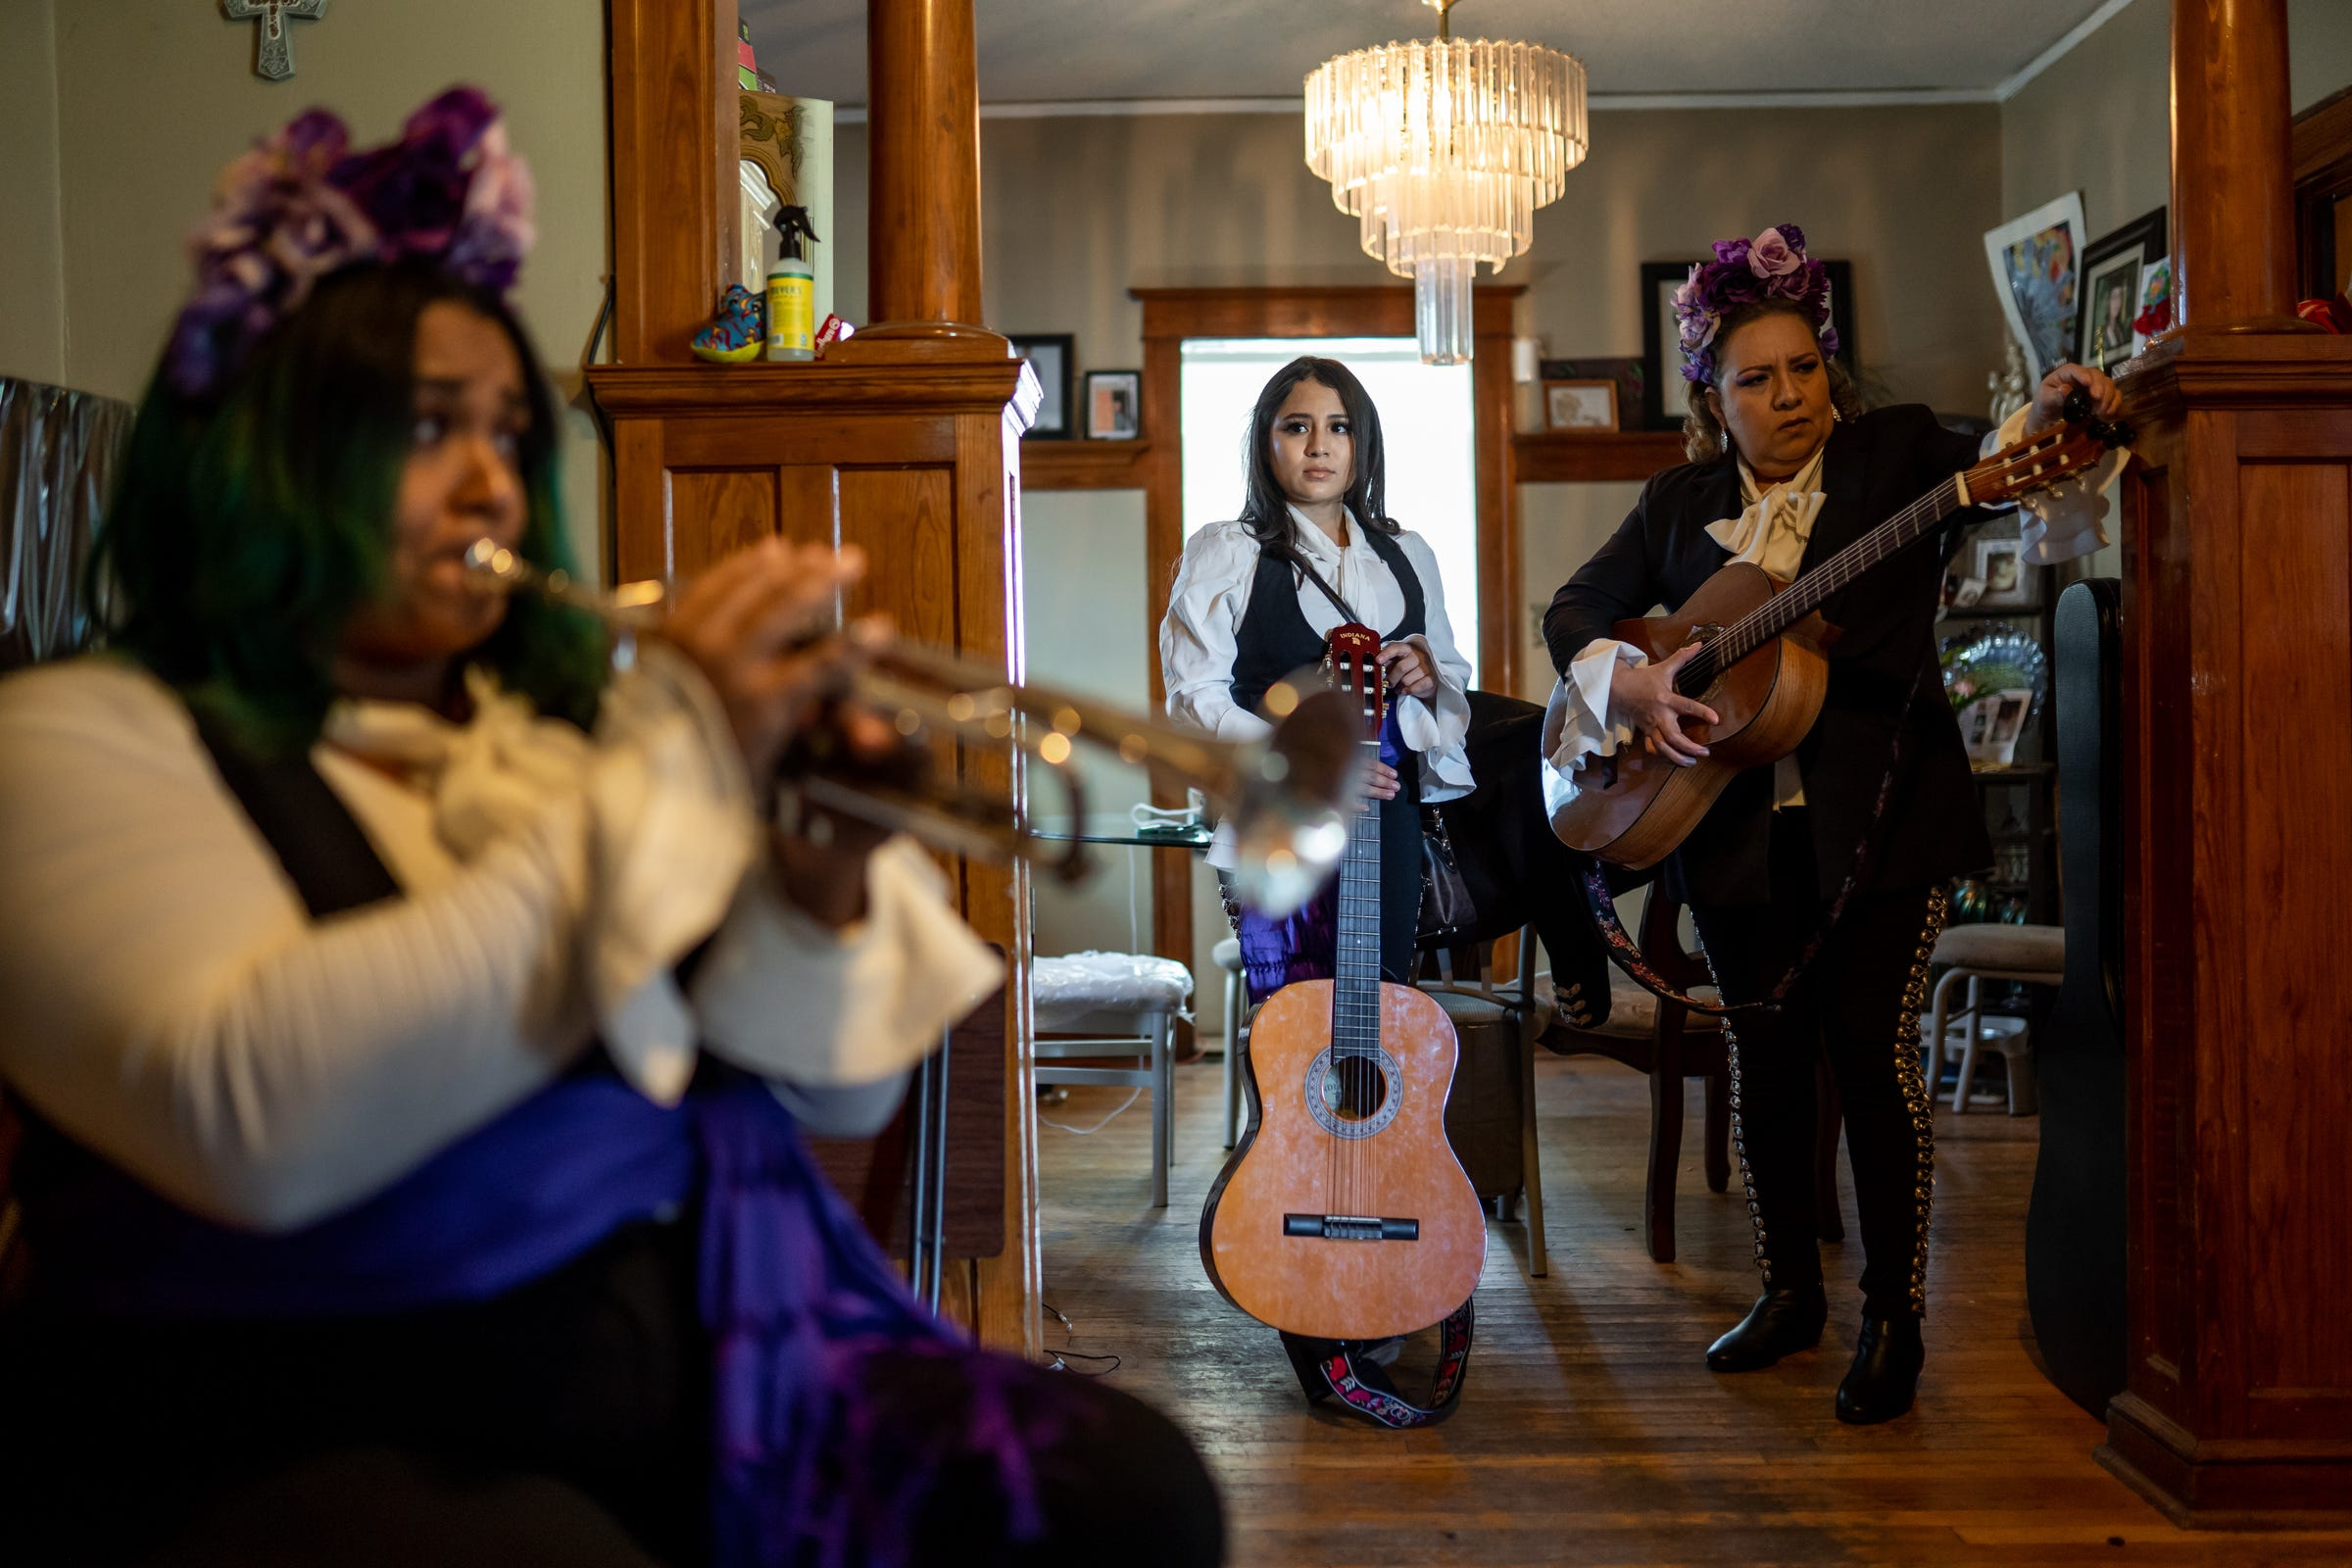 Meet Michigan's first five-member all-female mariachi band